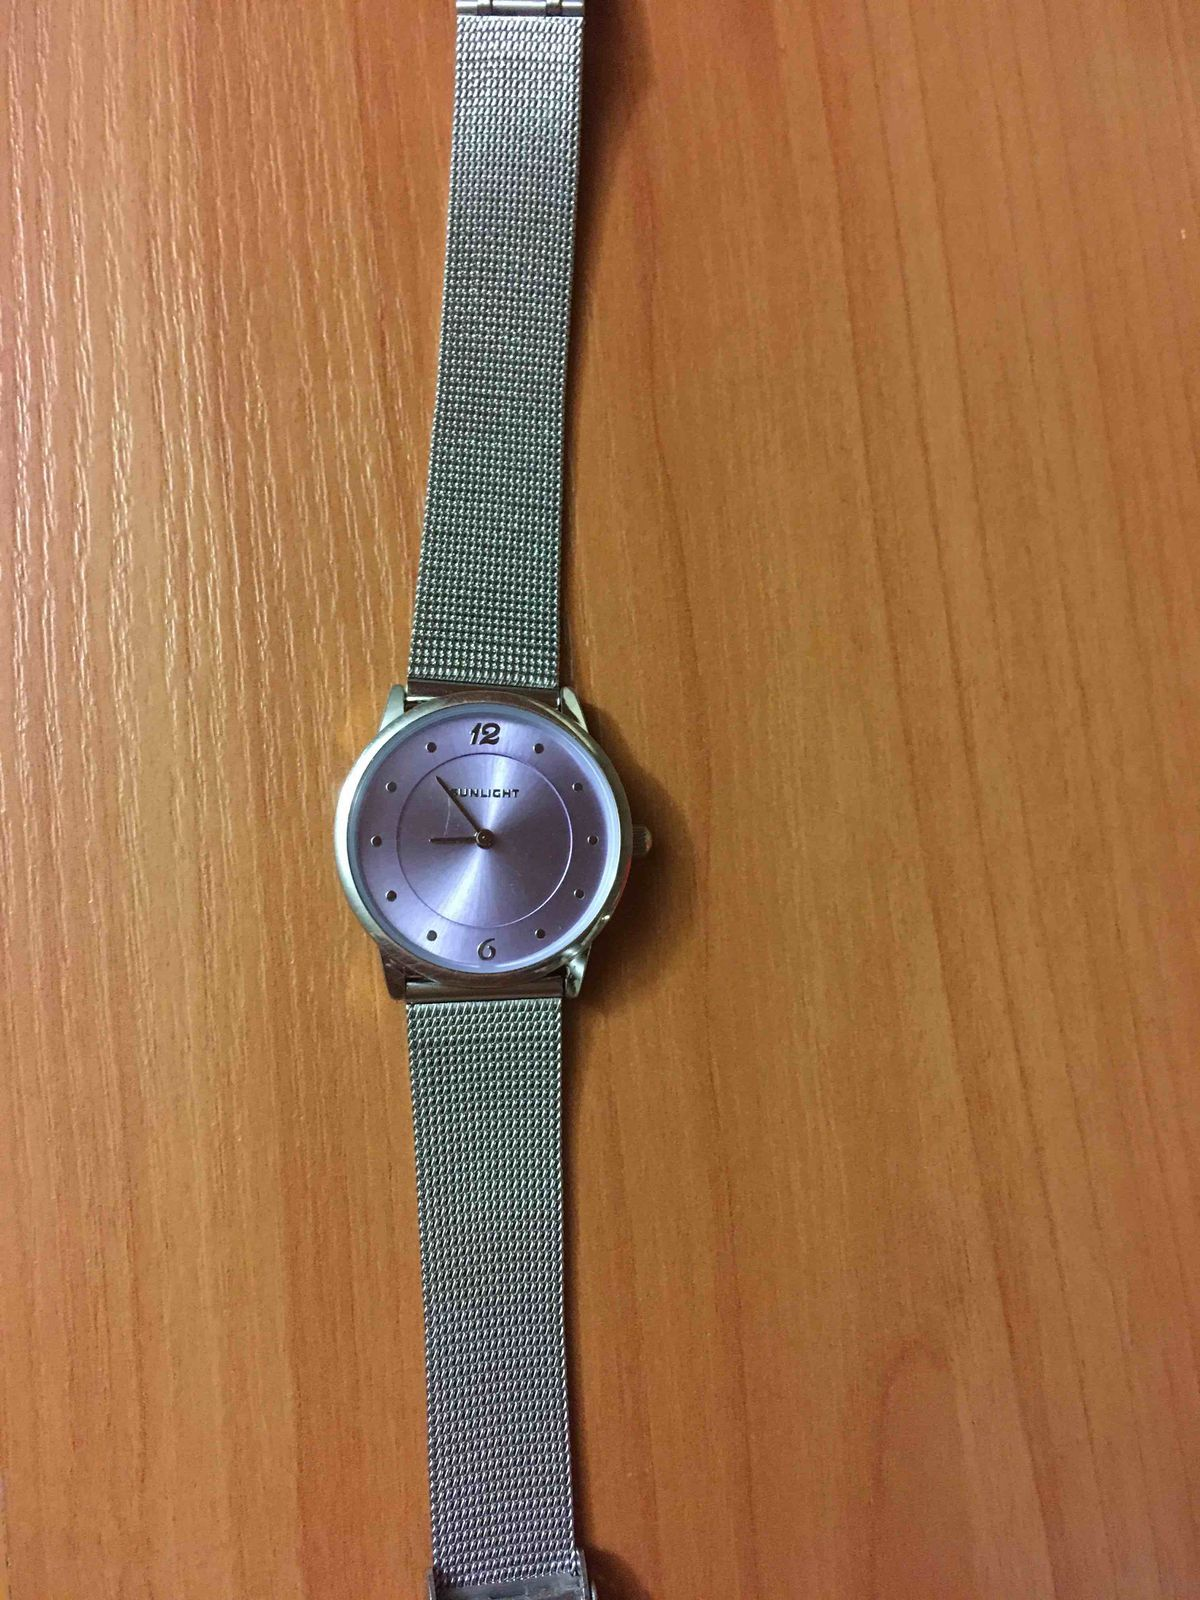 Очень элегантные часы)